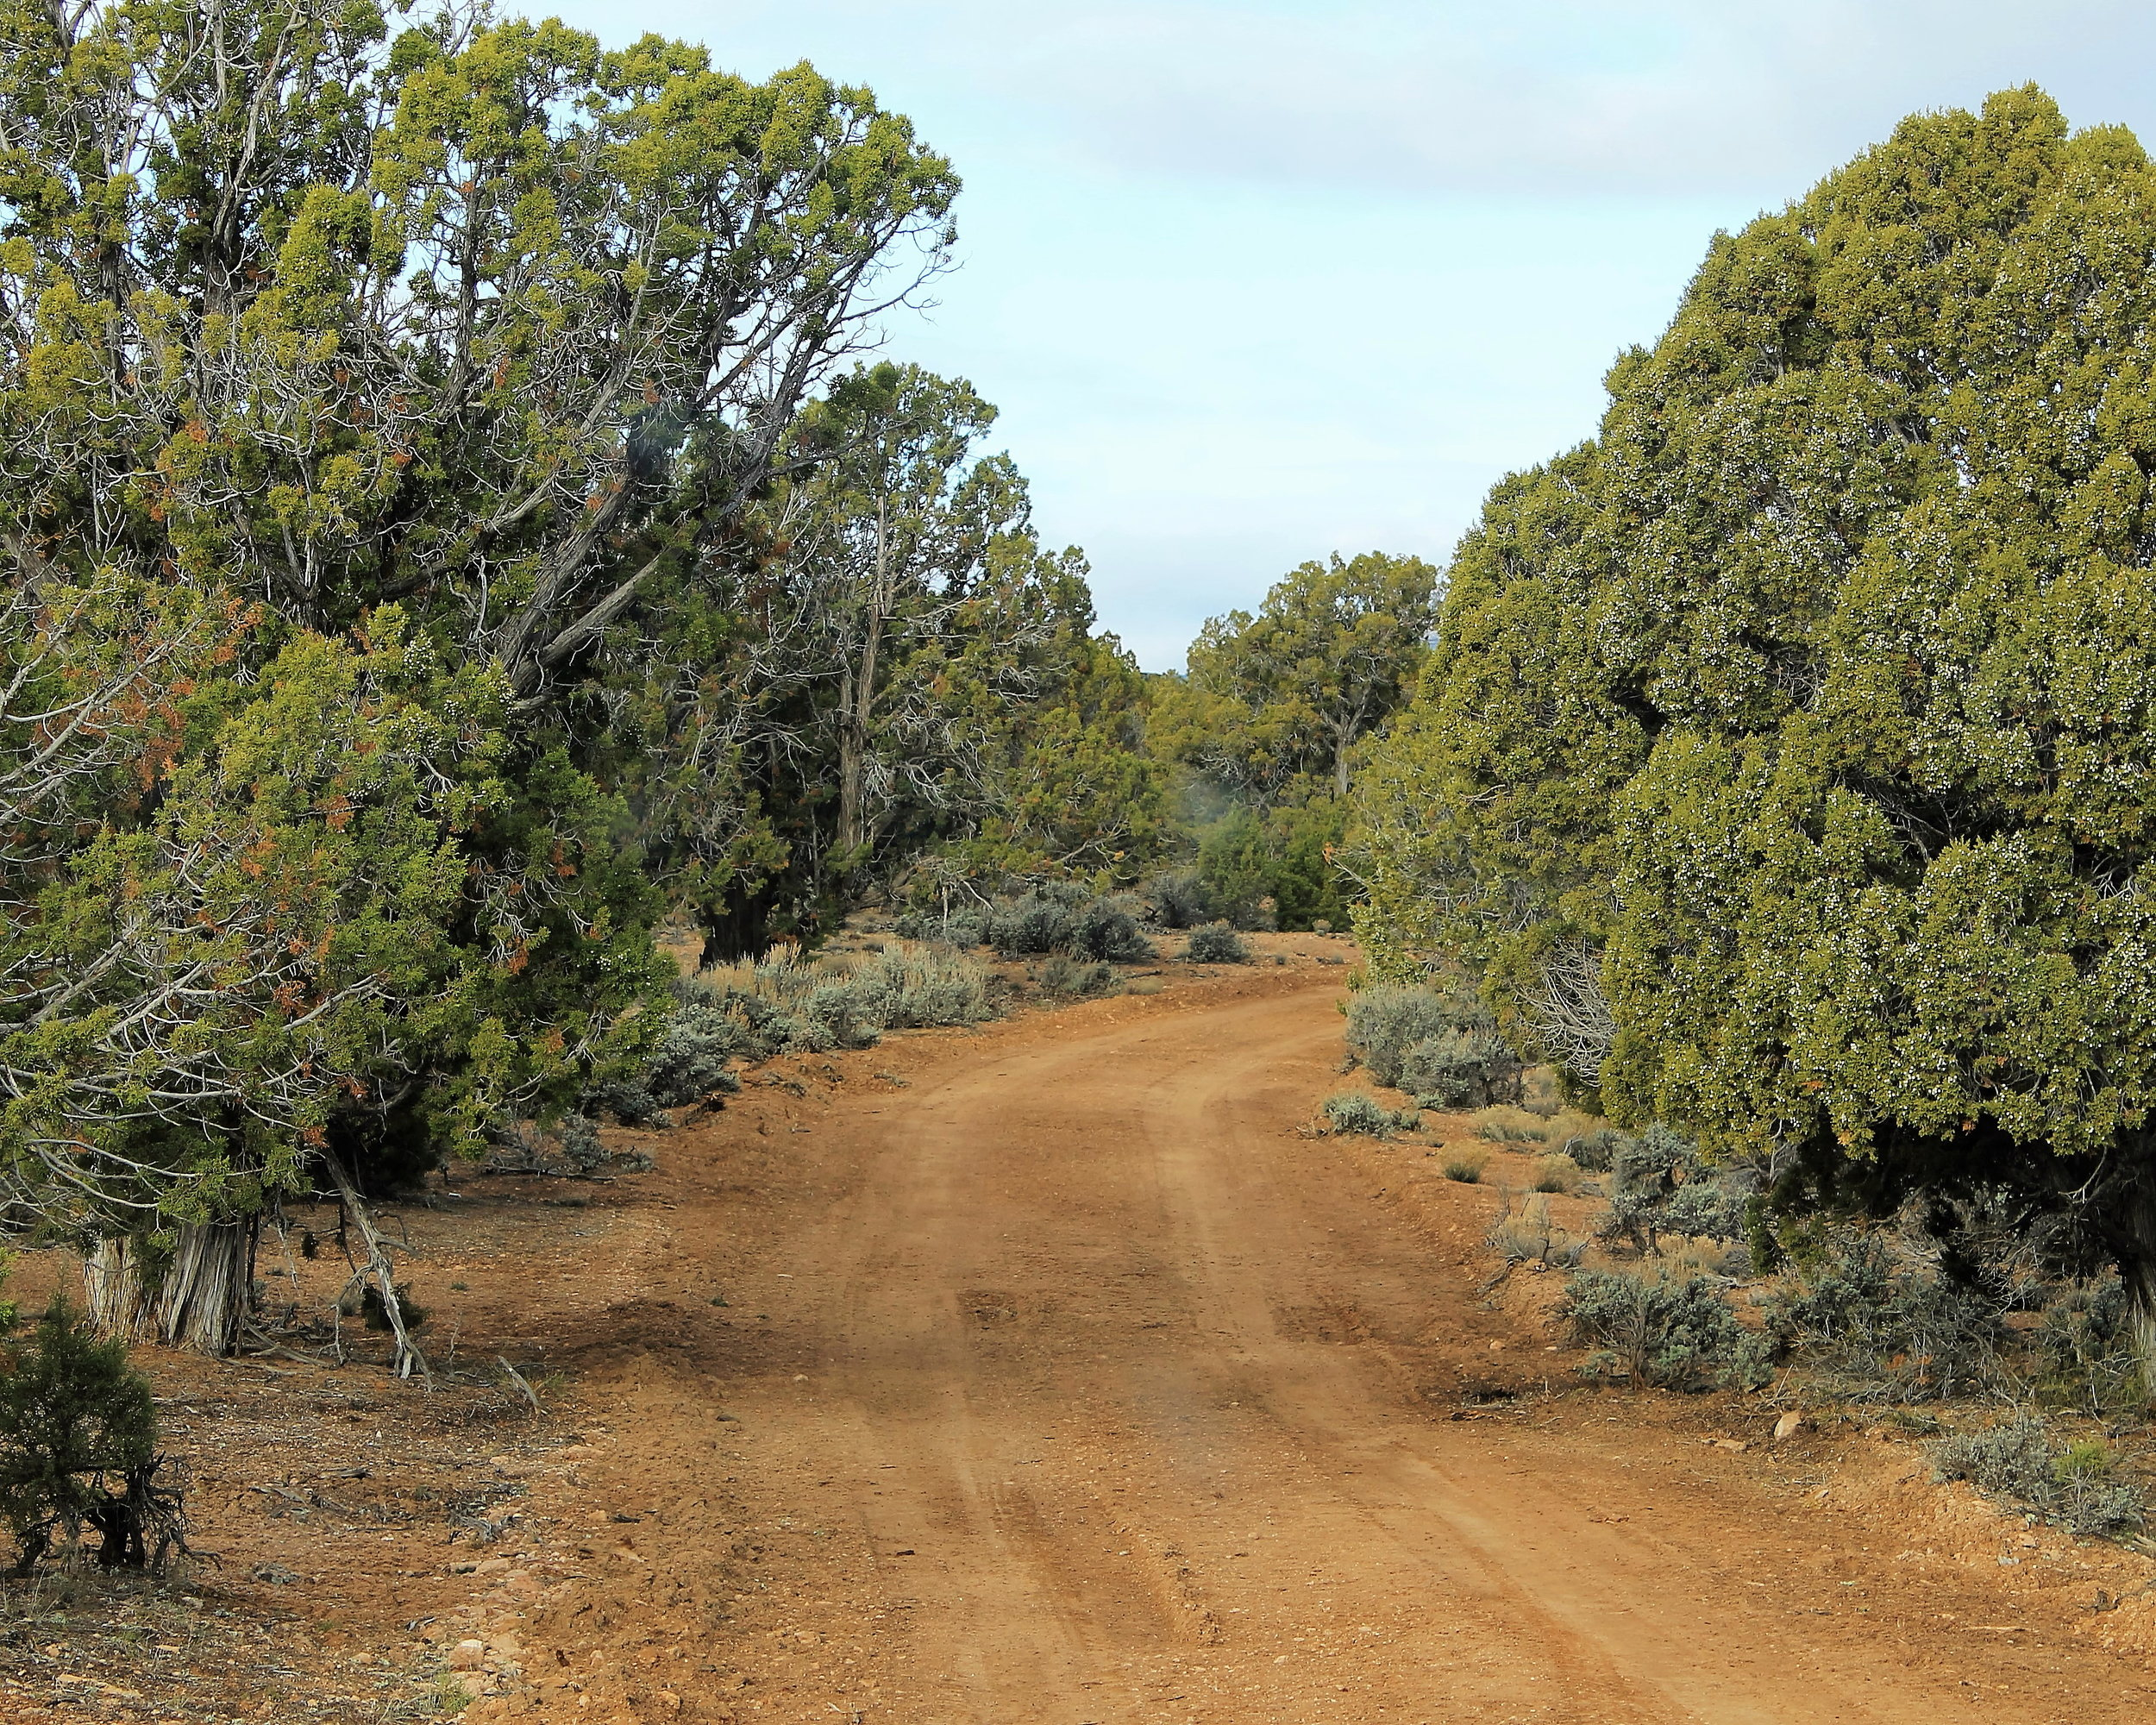 Sandy road through juniper forest